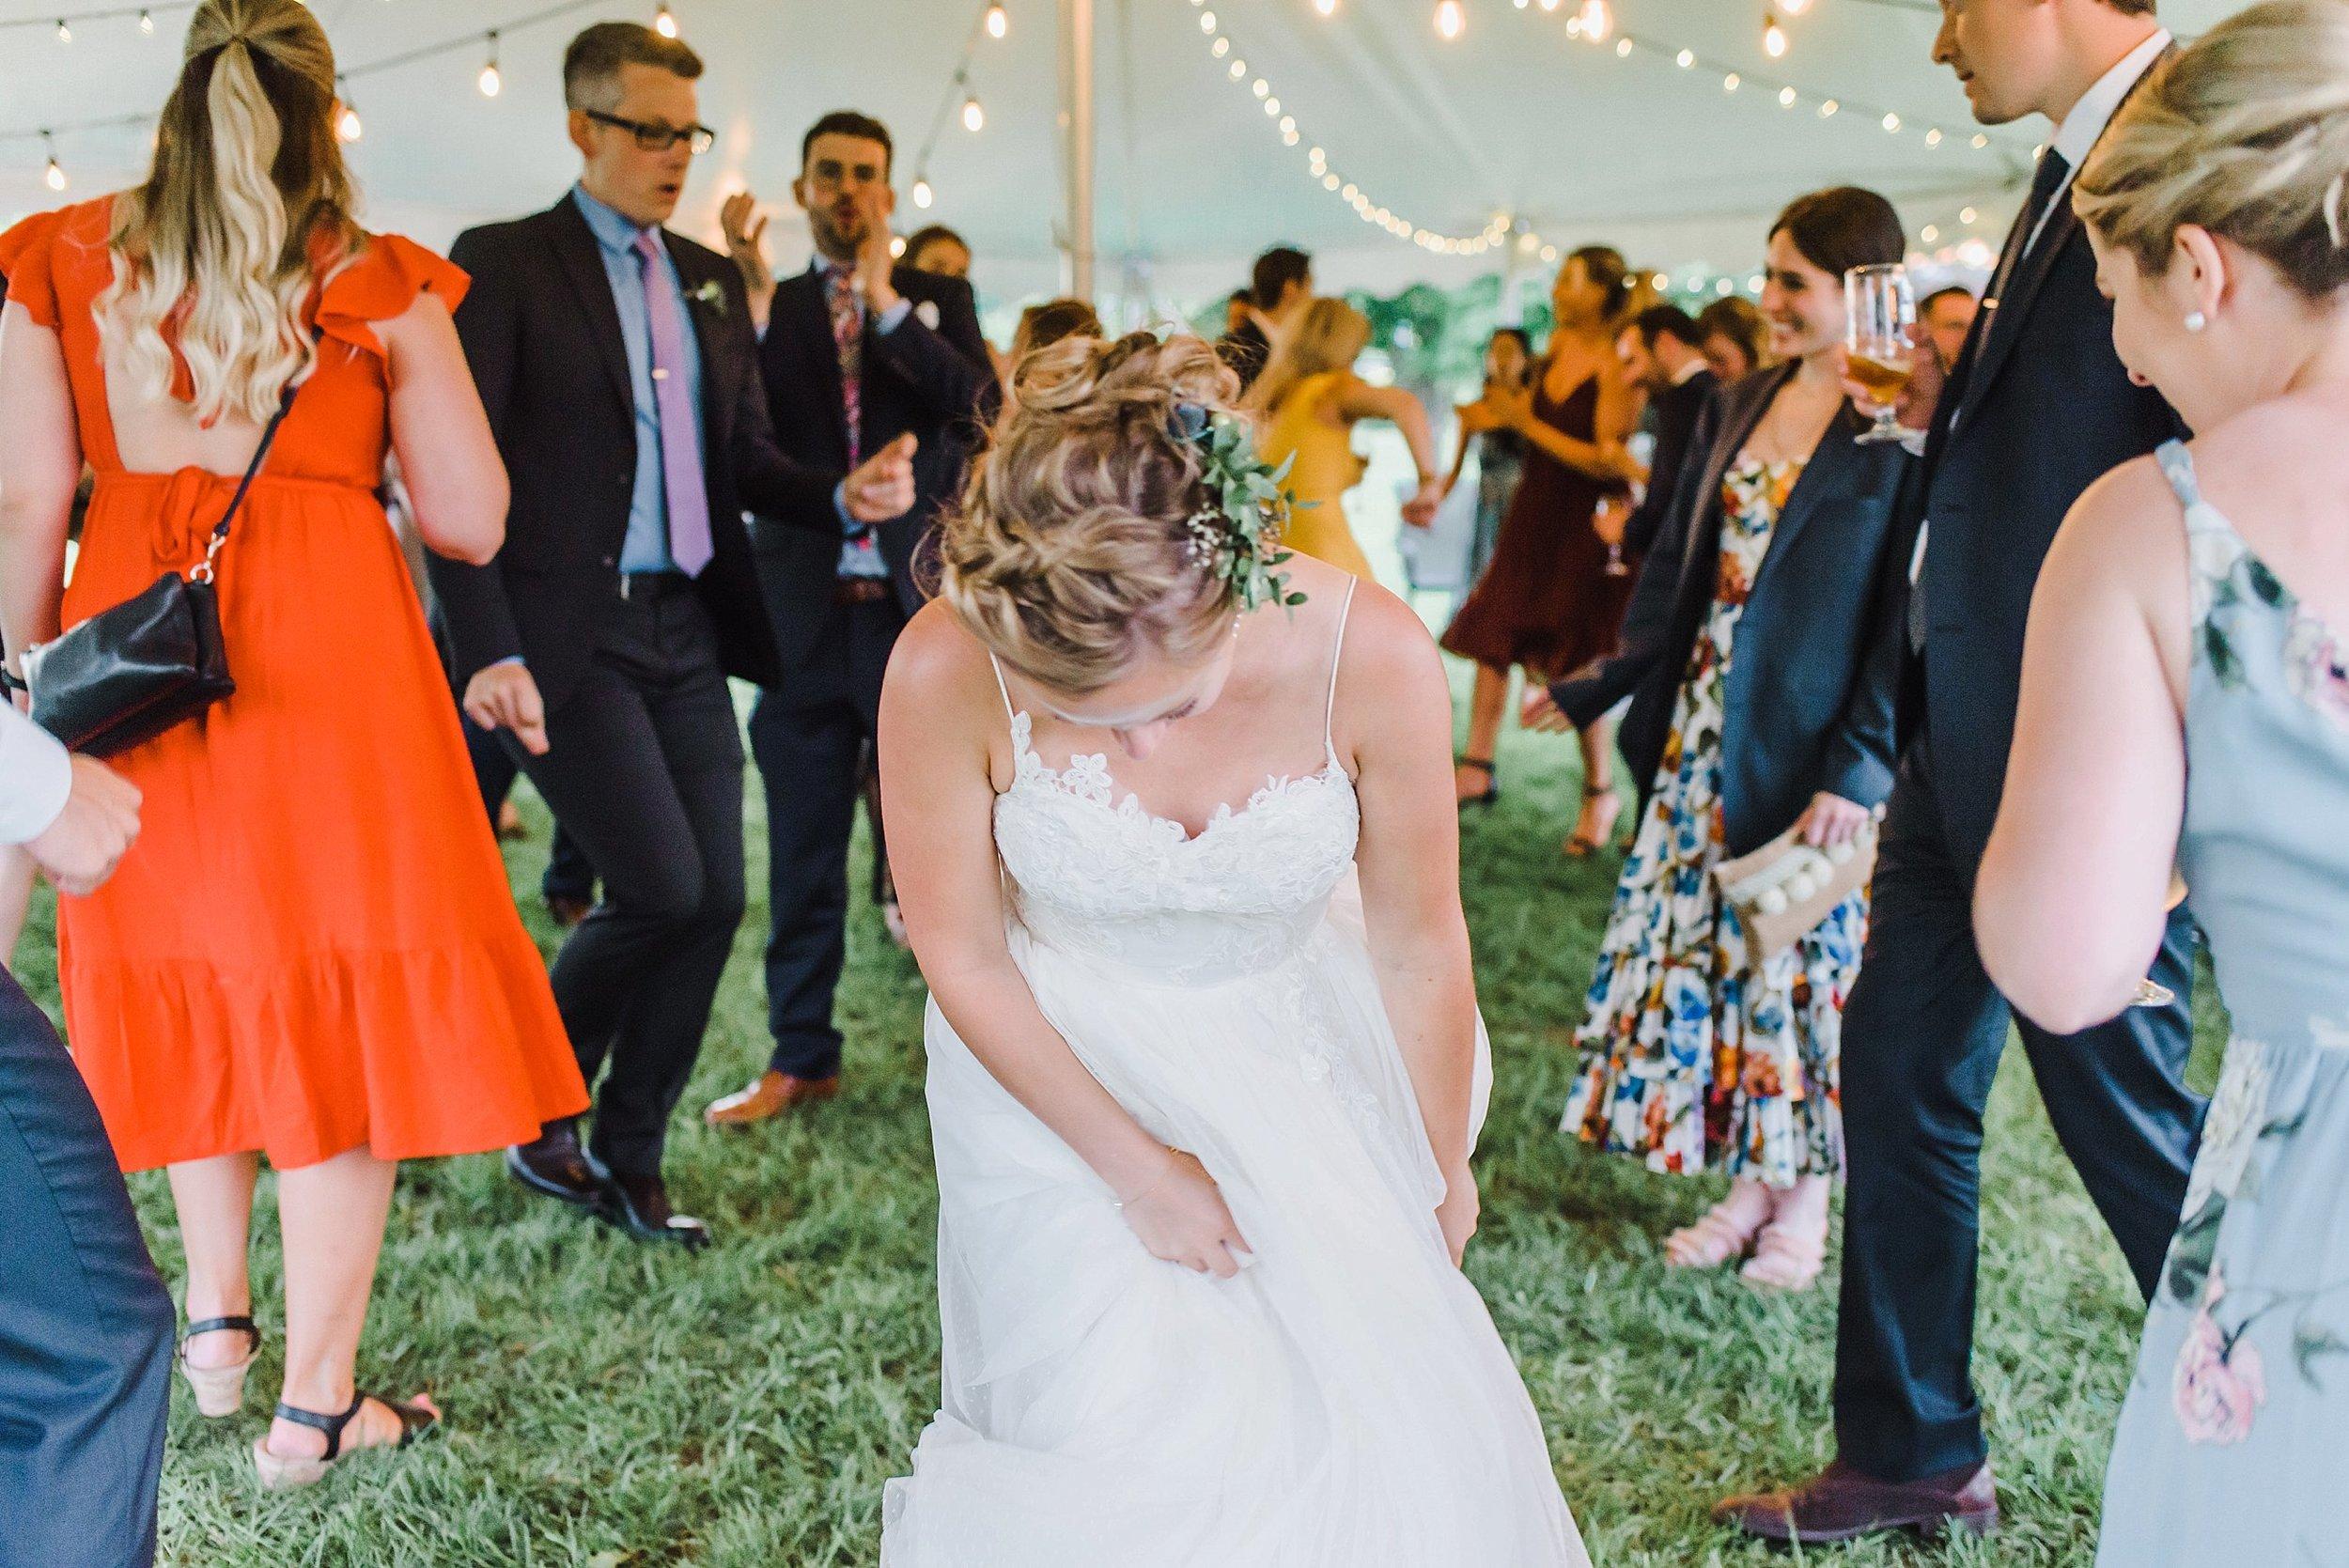 light airy indie fine art ottawa wedding photographer | Ali and Batoul Photography_0919.jpg